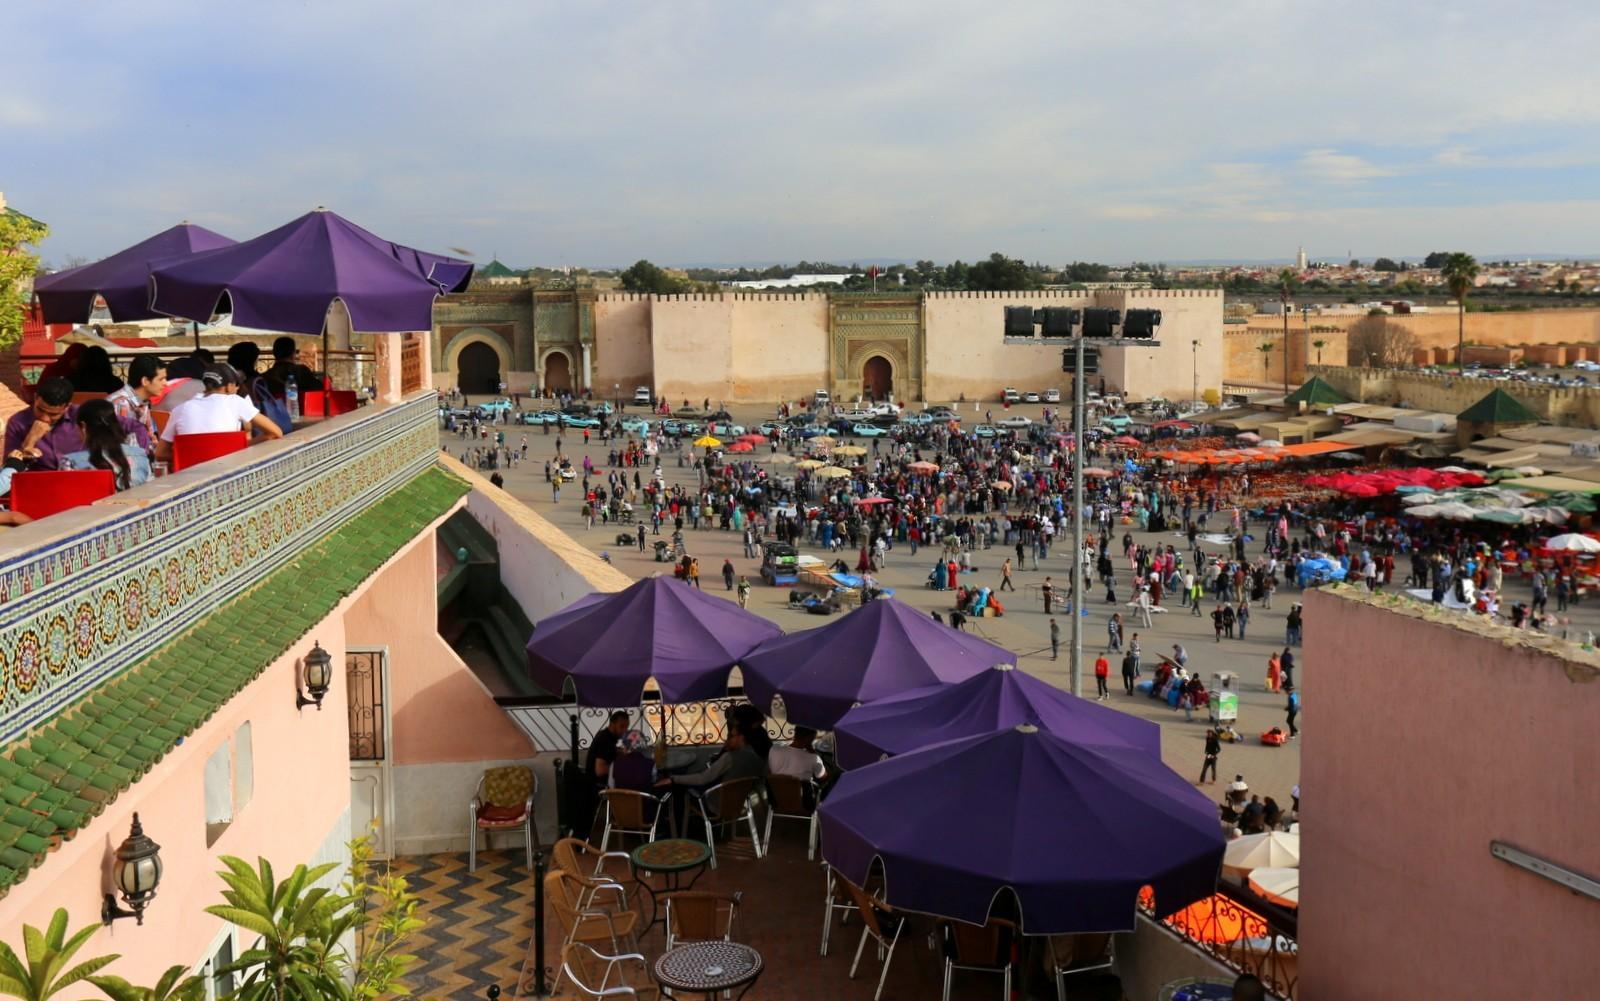 Meknes El Hedim Square